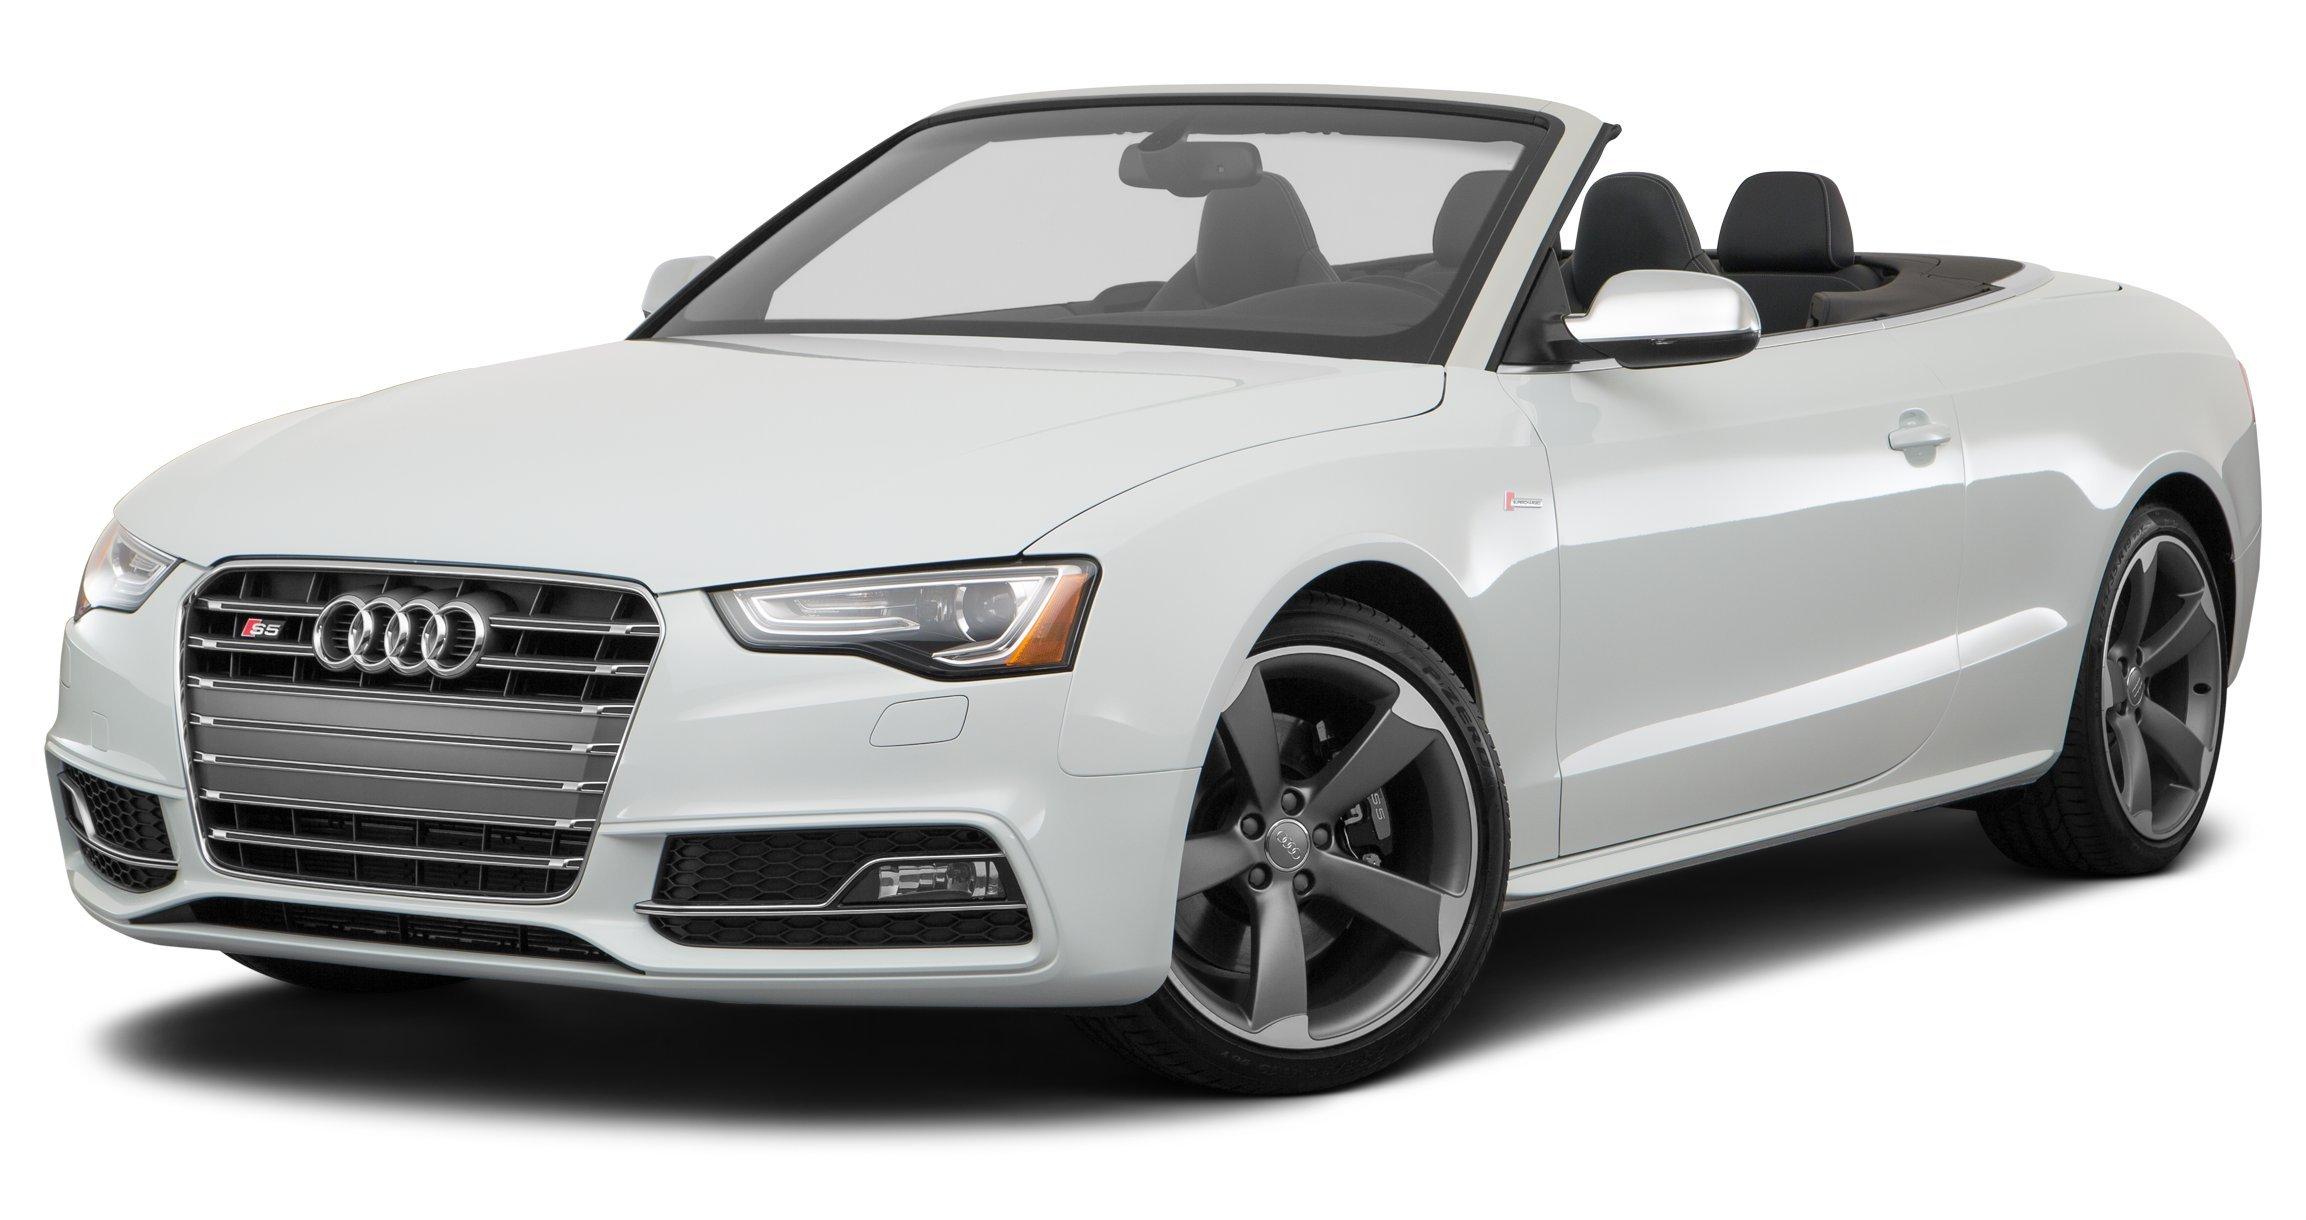 Amazon 2017 Audi S5 Reviews and Specs Vehicles